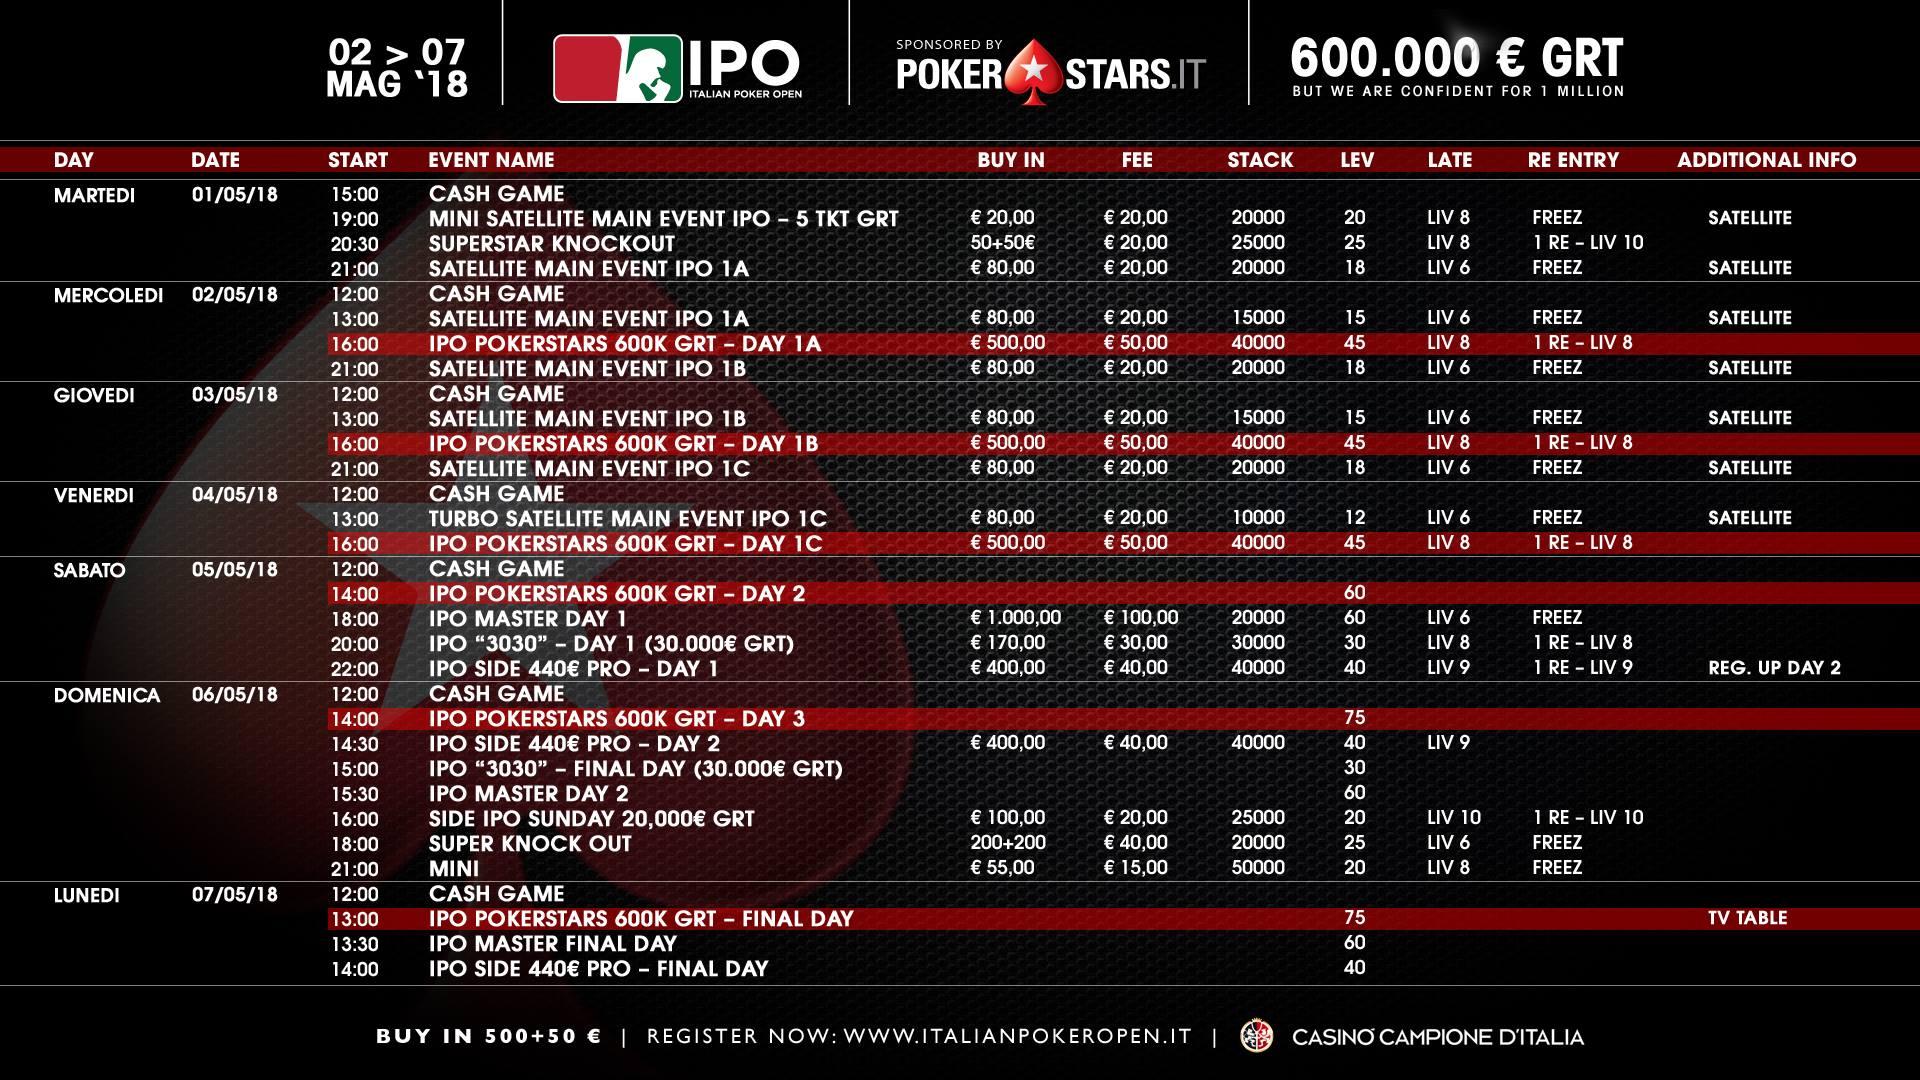 ipo pokerstars maggio programma